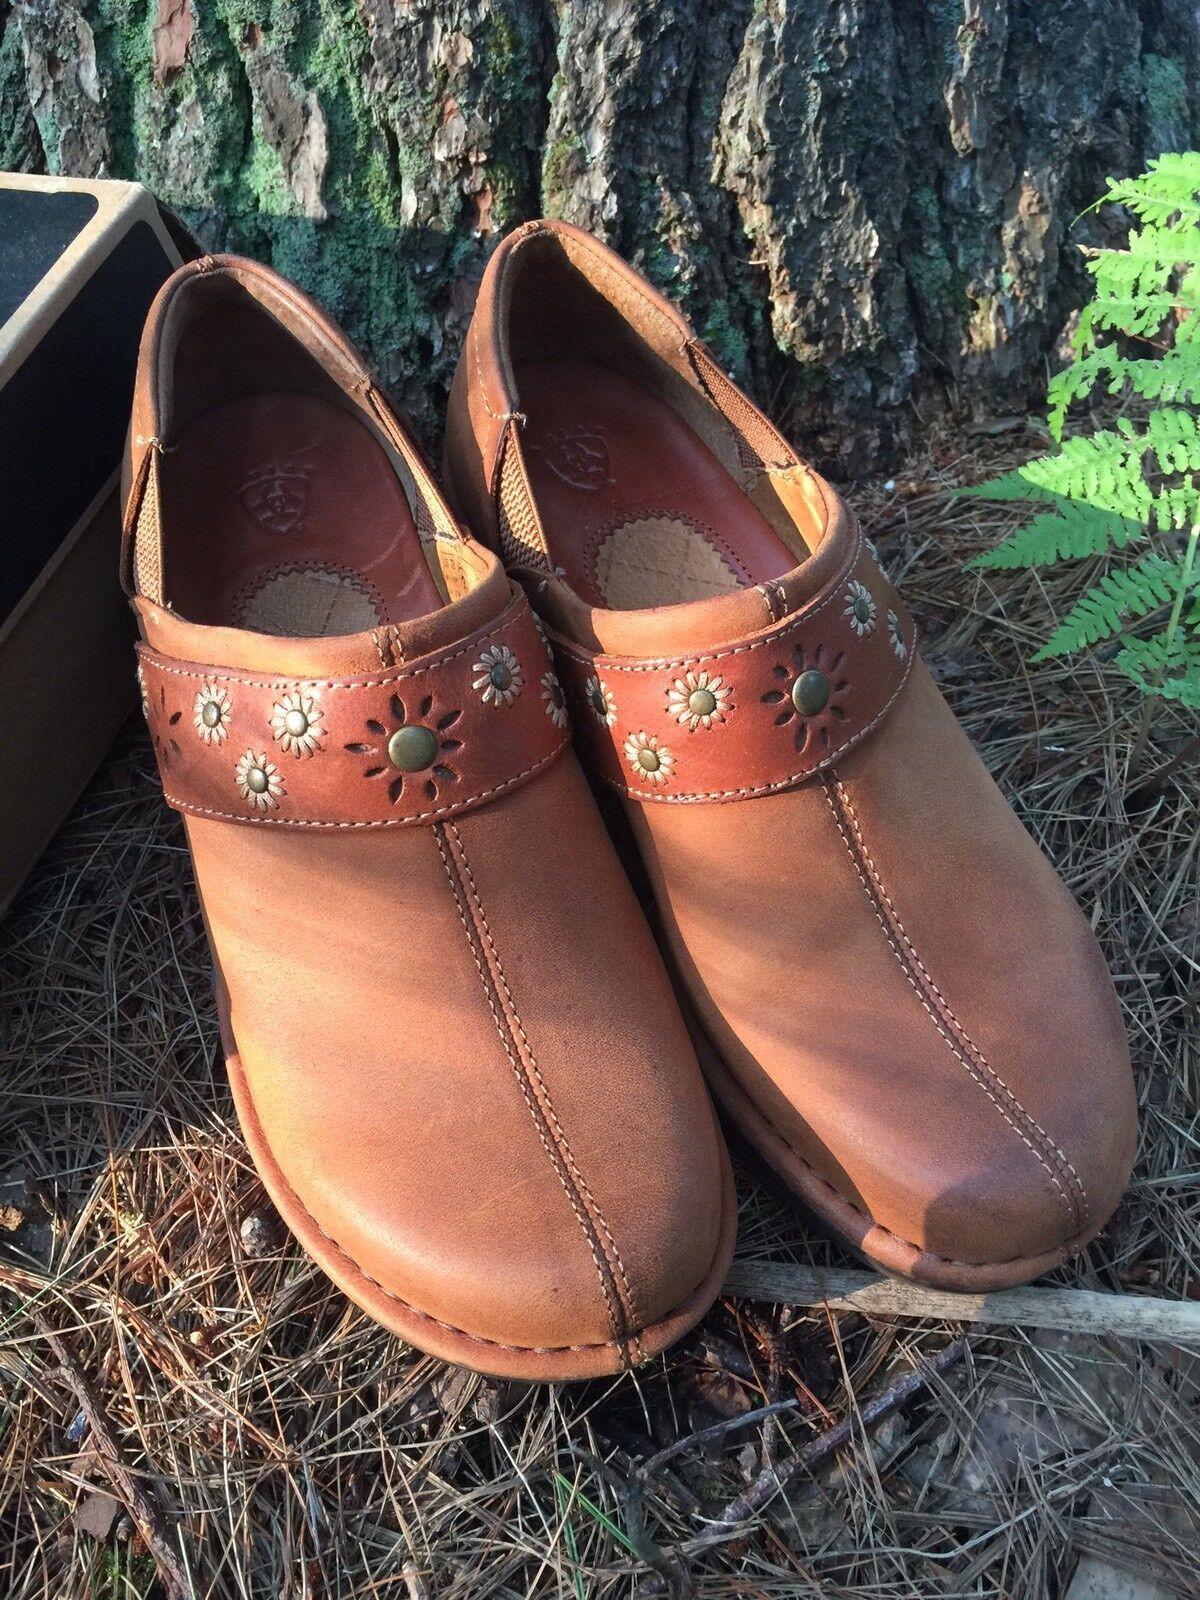 ARIAT WESTLAKE 15109 Brush Russet Leather Split Toe Wedge Clog Brown Women Sz 7